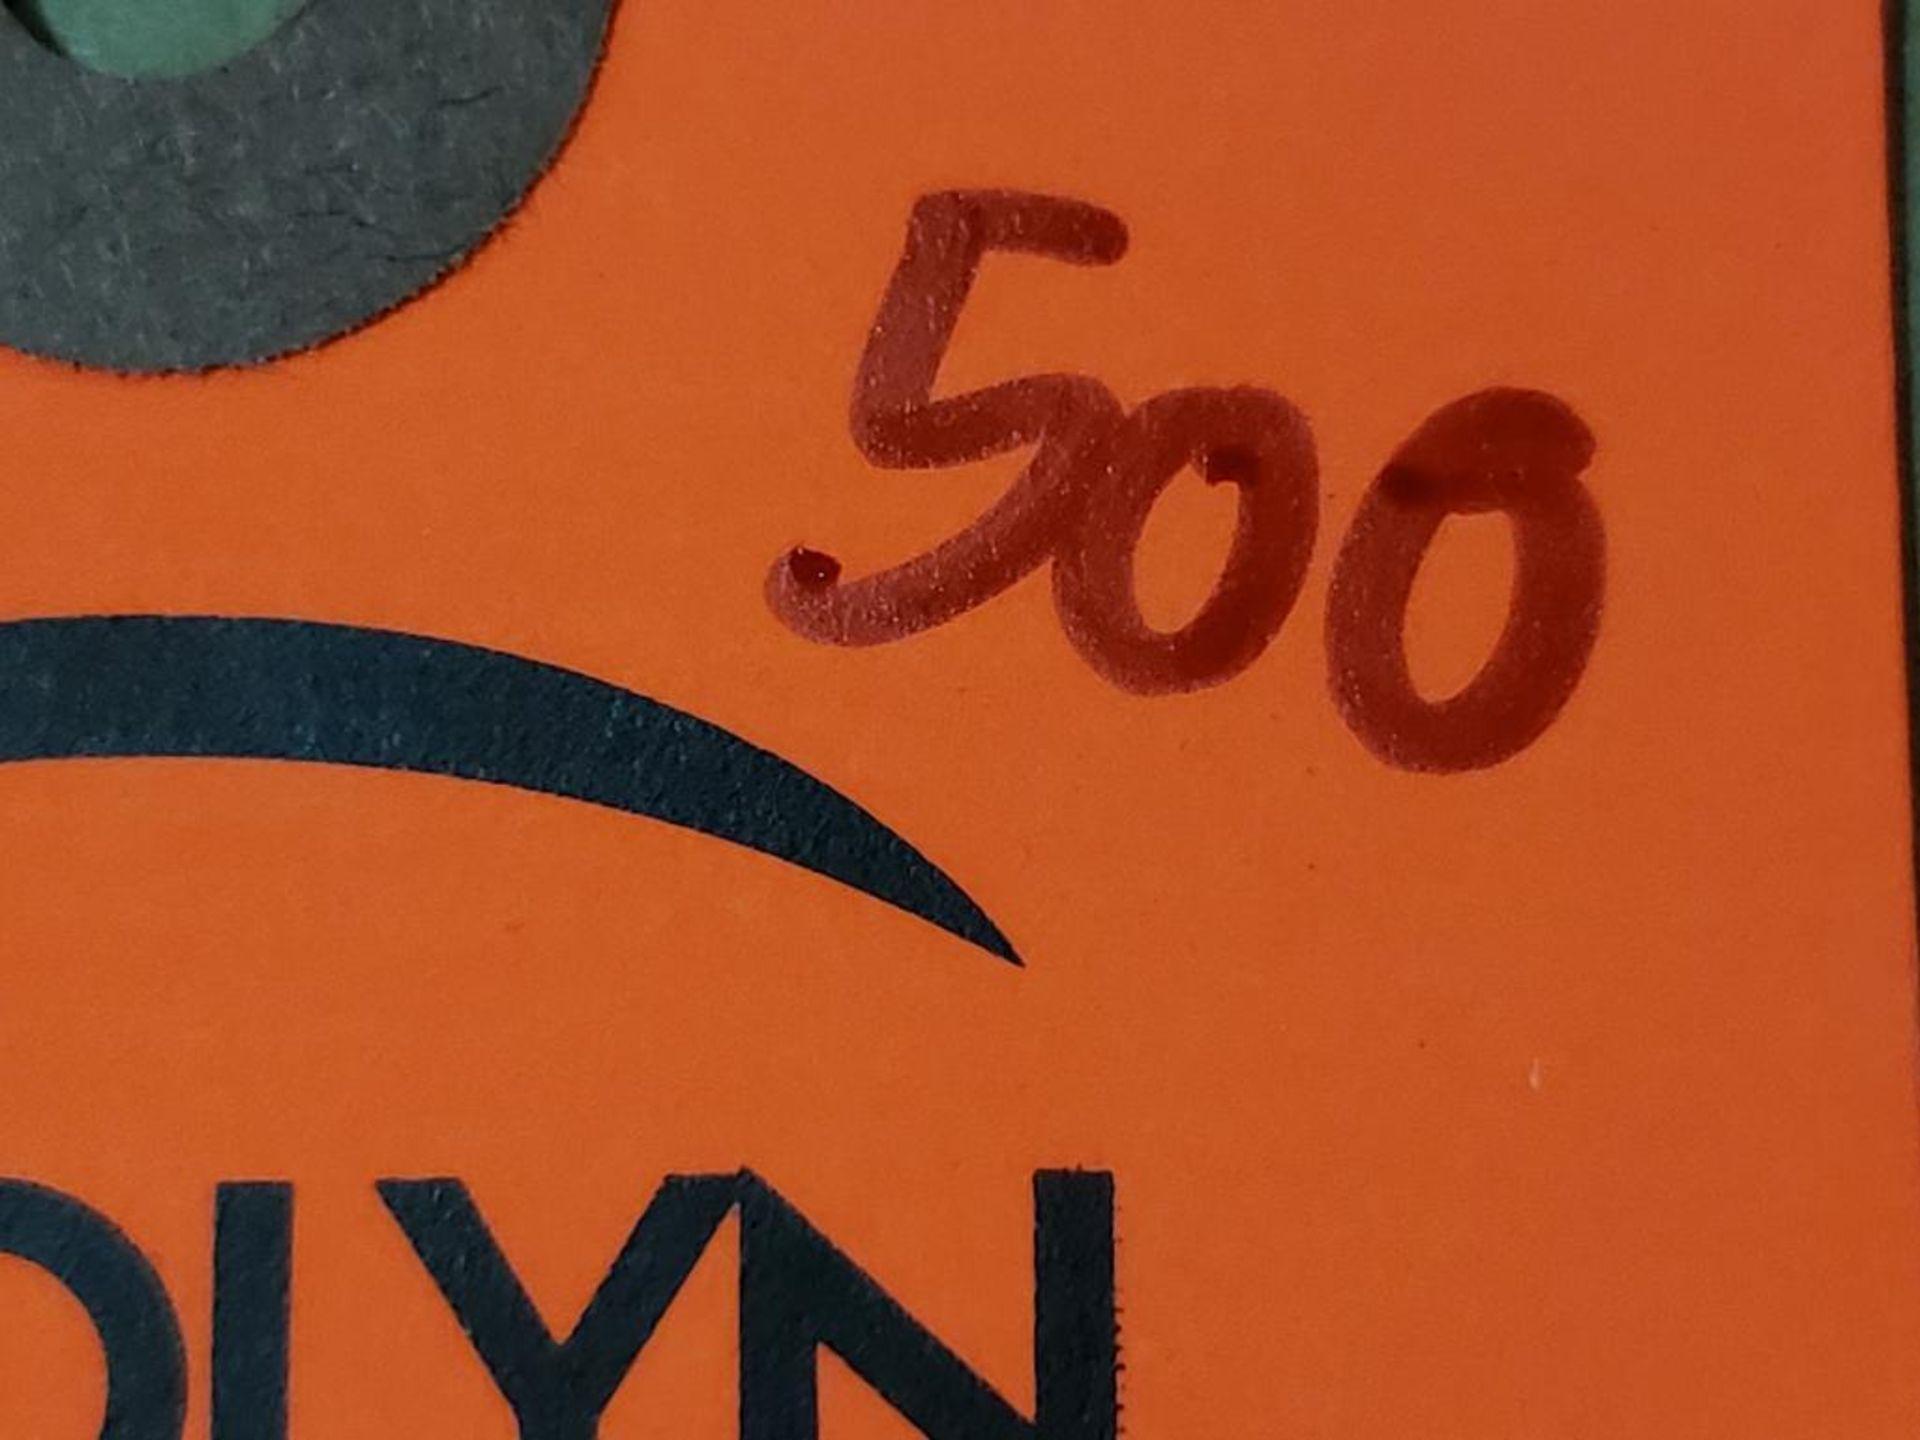 Qty 500 - Sunon MagLev MC25101V2-000U-A99 12VDC Fan. - Image 4 of 4